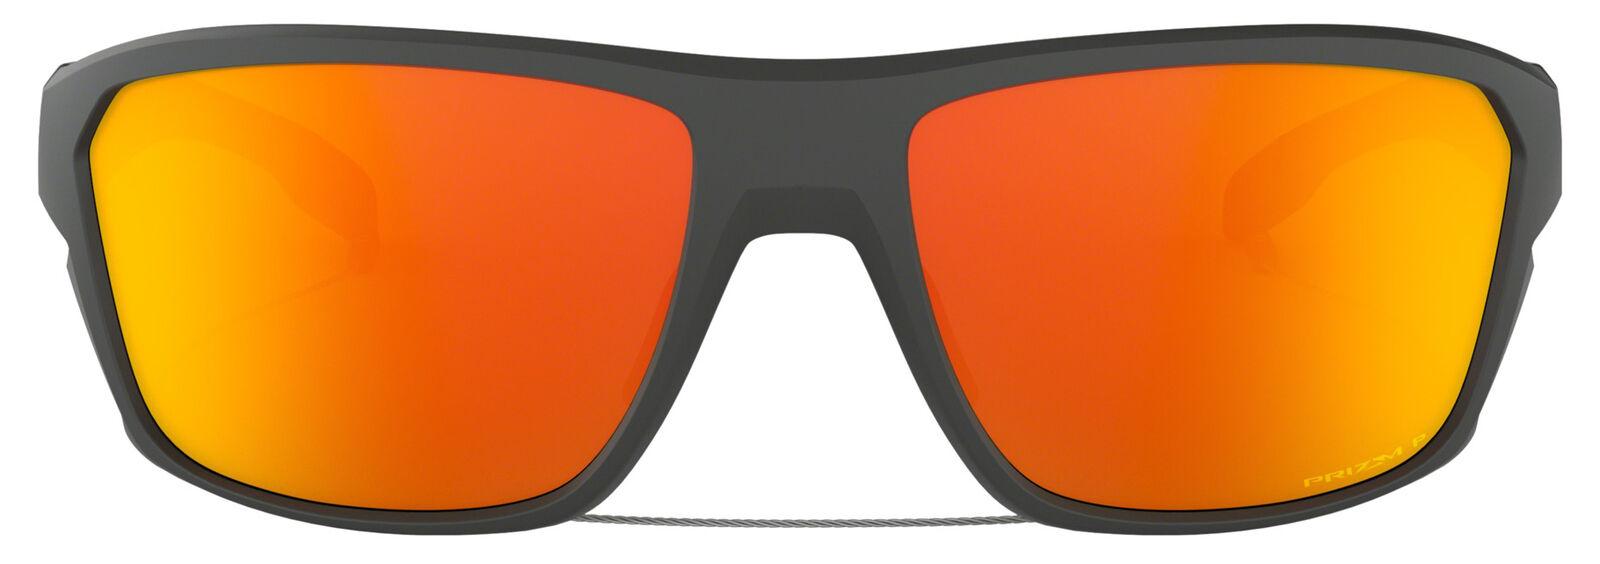 473485f36639 Oakley Split Shot Men s Sunglasses - Matte Heather Grey Frame